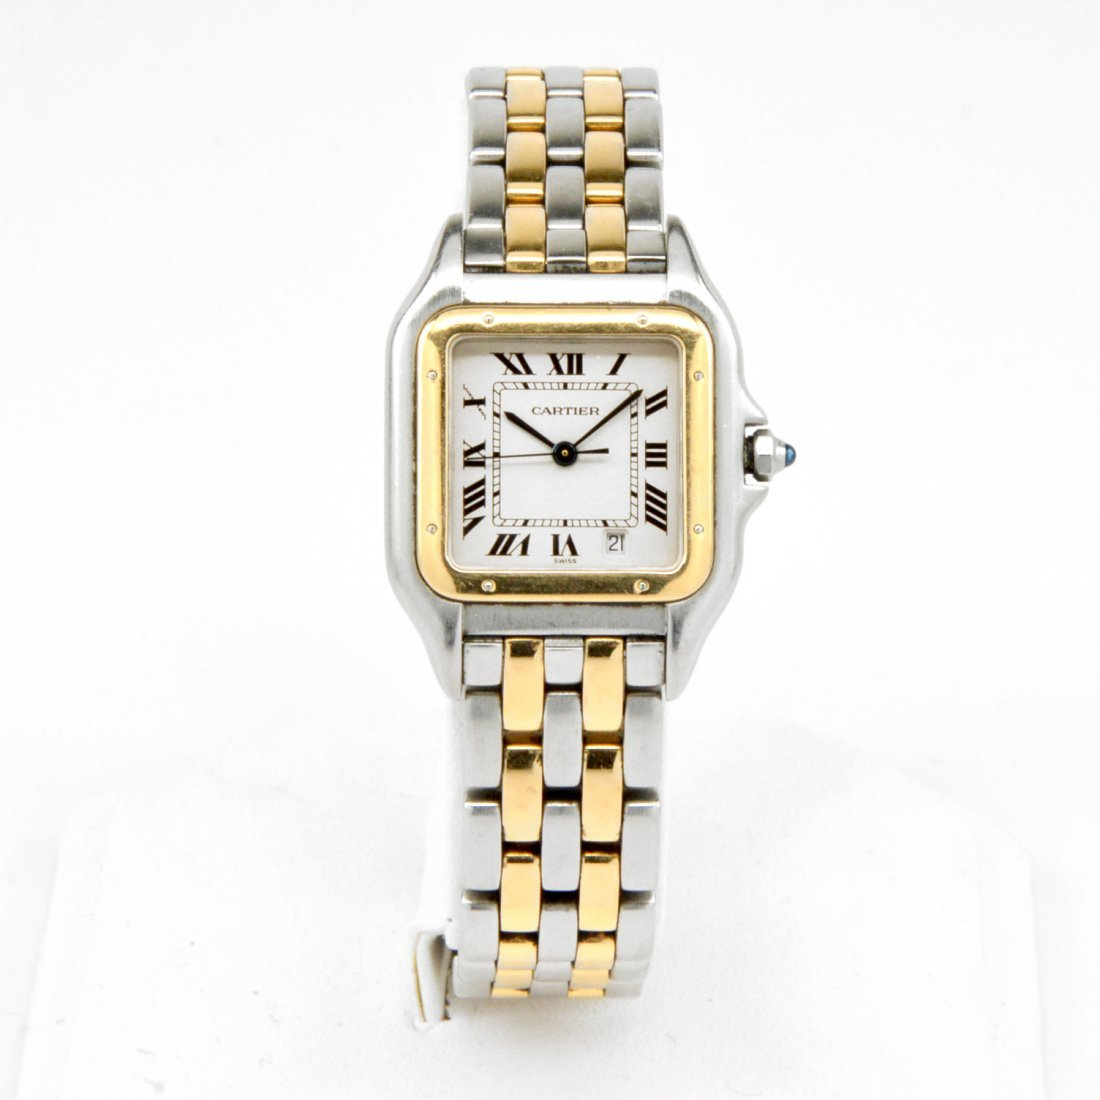 18k Gold & Steel Cartier Panther Watch